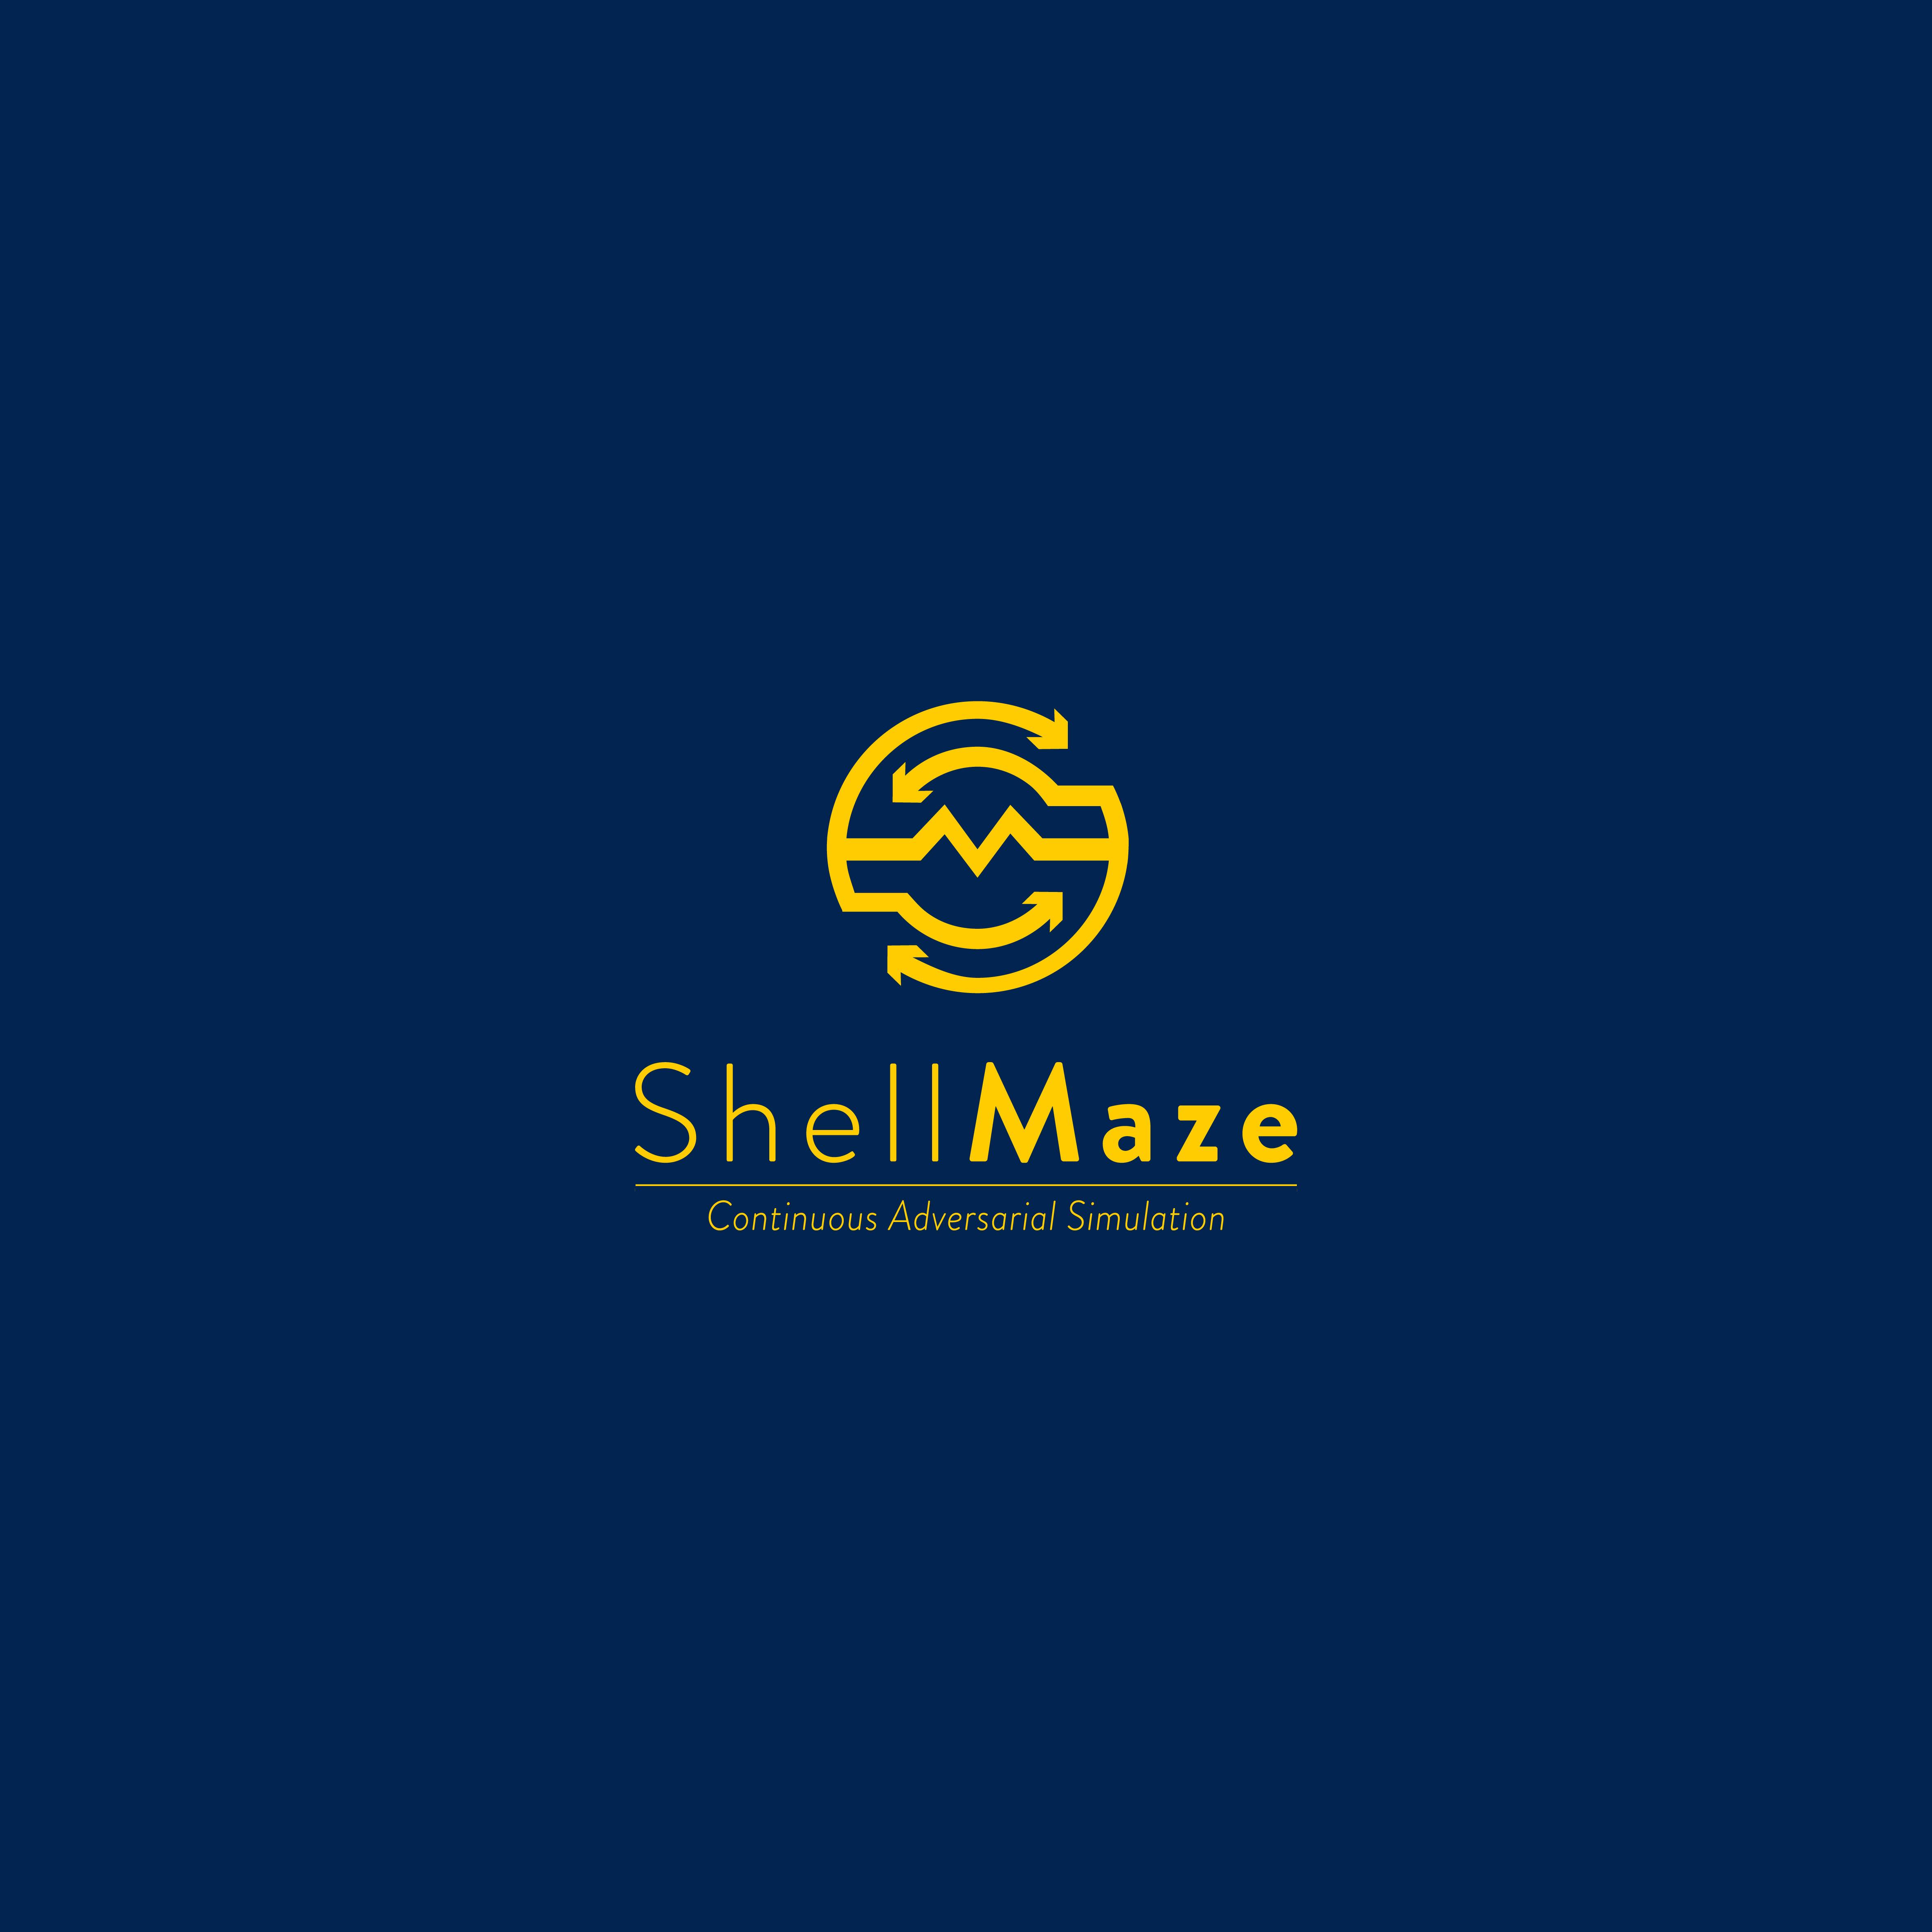 Winning Entry #159 for Logo Design contest - Security Logo Design required by ShellMaze - original